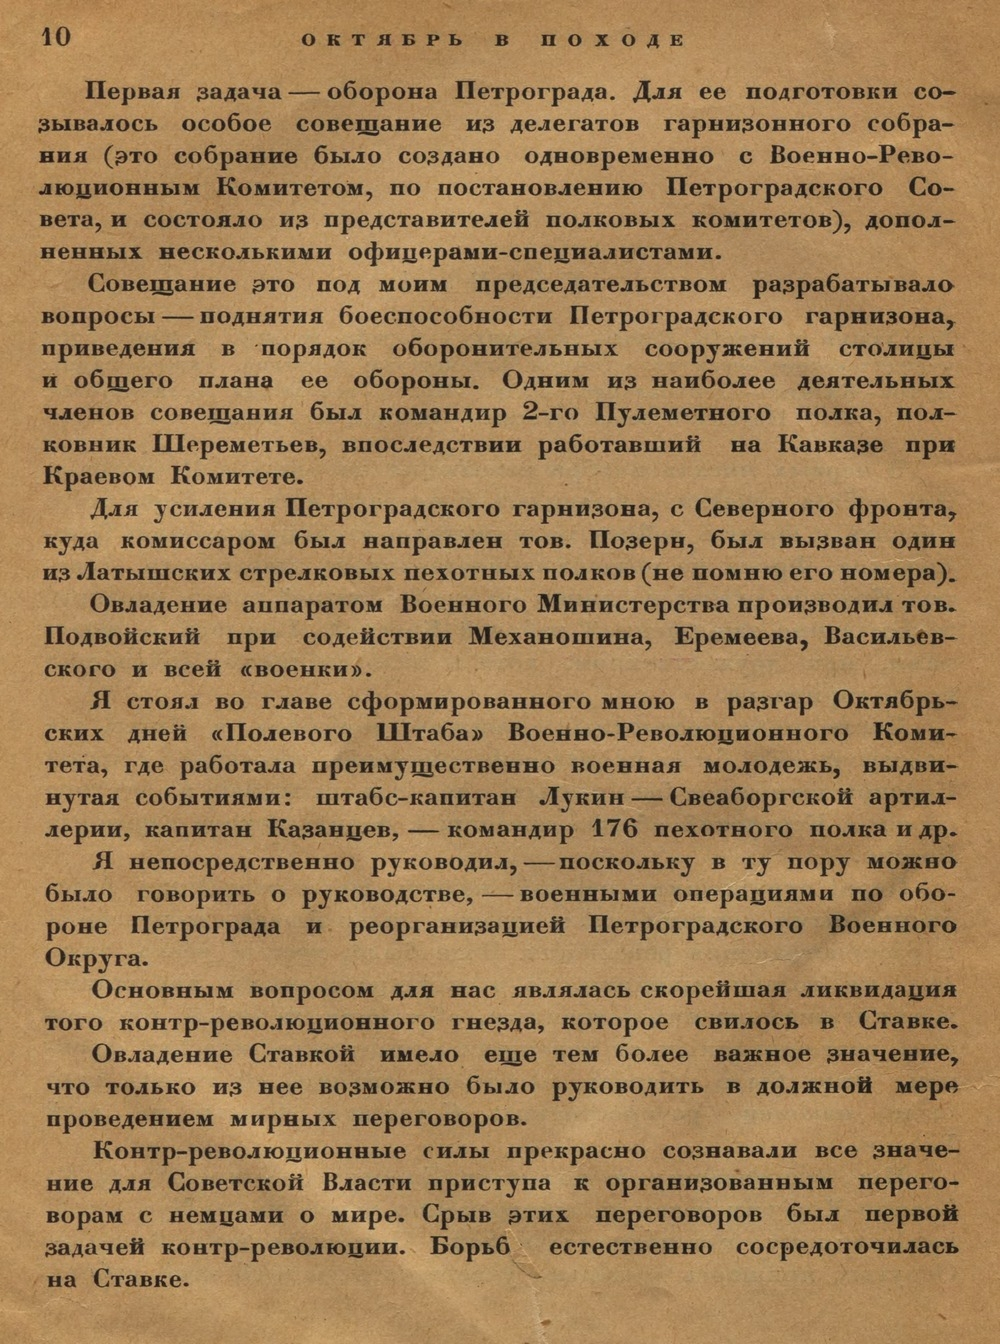 http://i1.imageban.ru/out/2014/01/17/5f02a09fc902f279d921af1ac3ed7d14.jpg